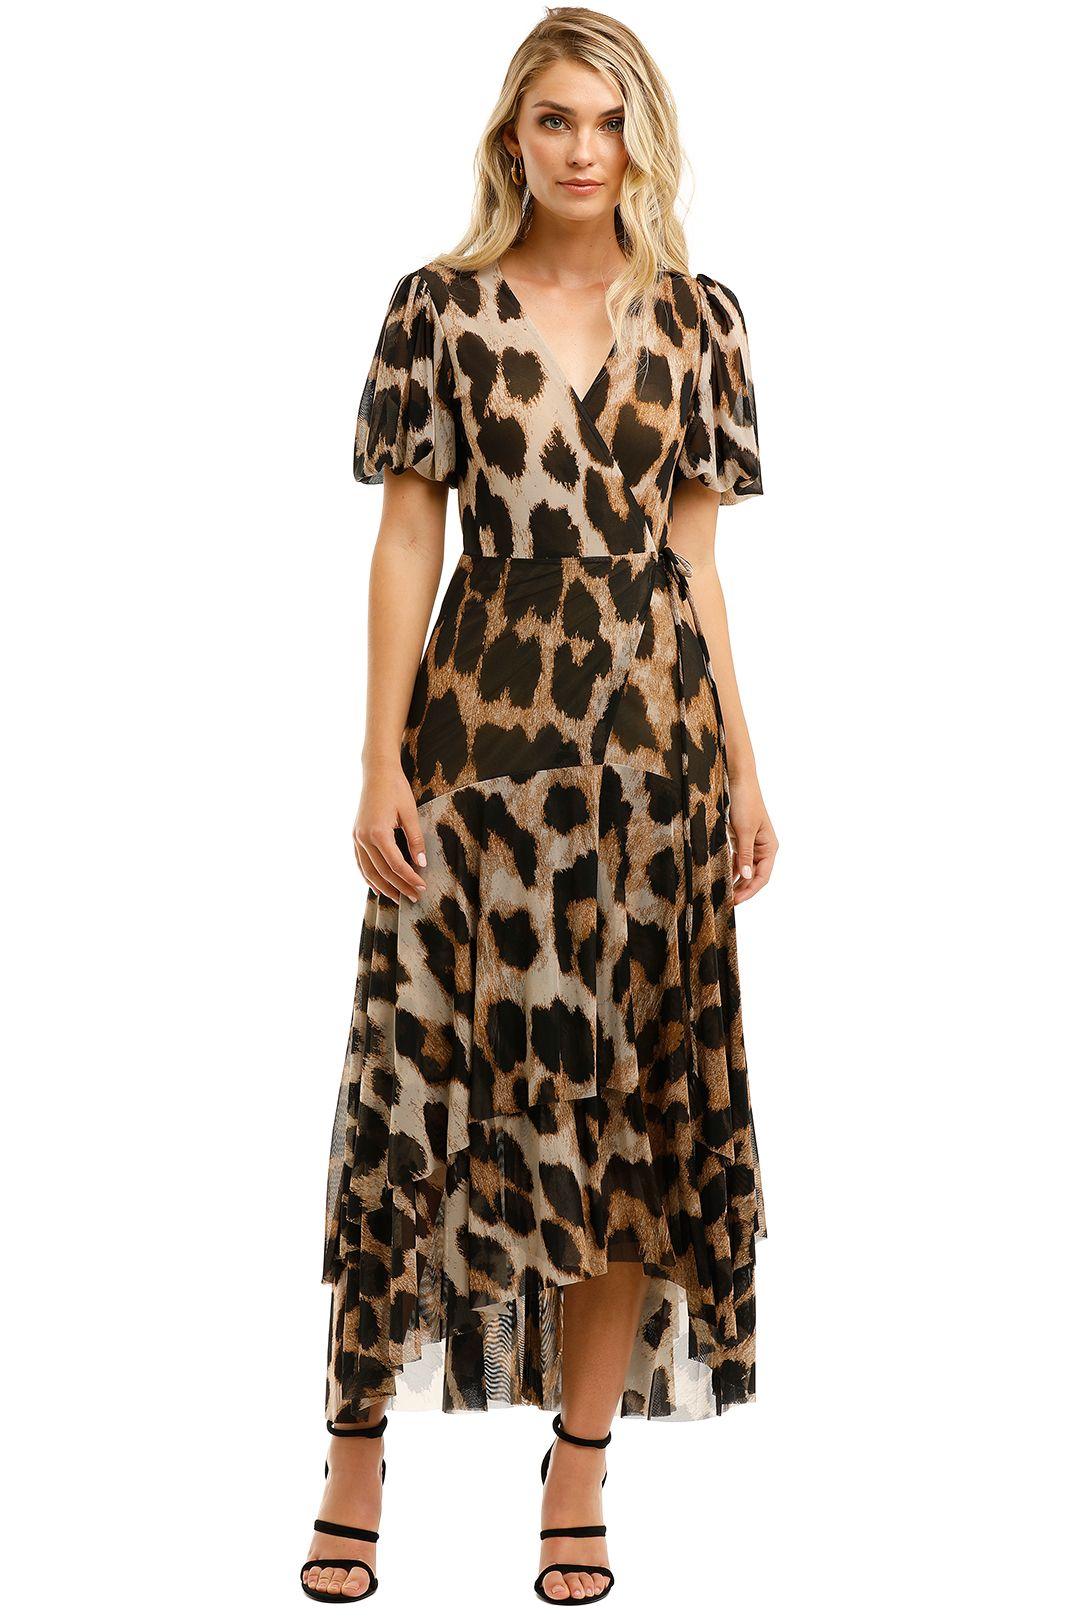 Ganni-Leo-Sleeves-Maxi-Dress-Leopard-Front